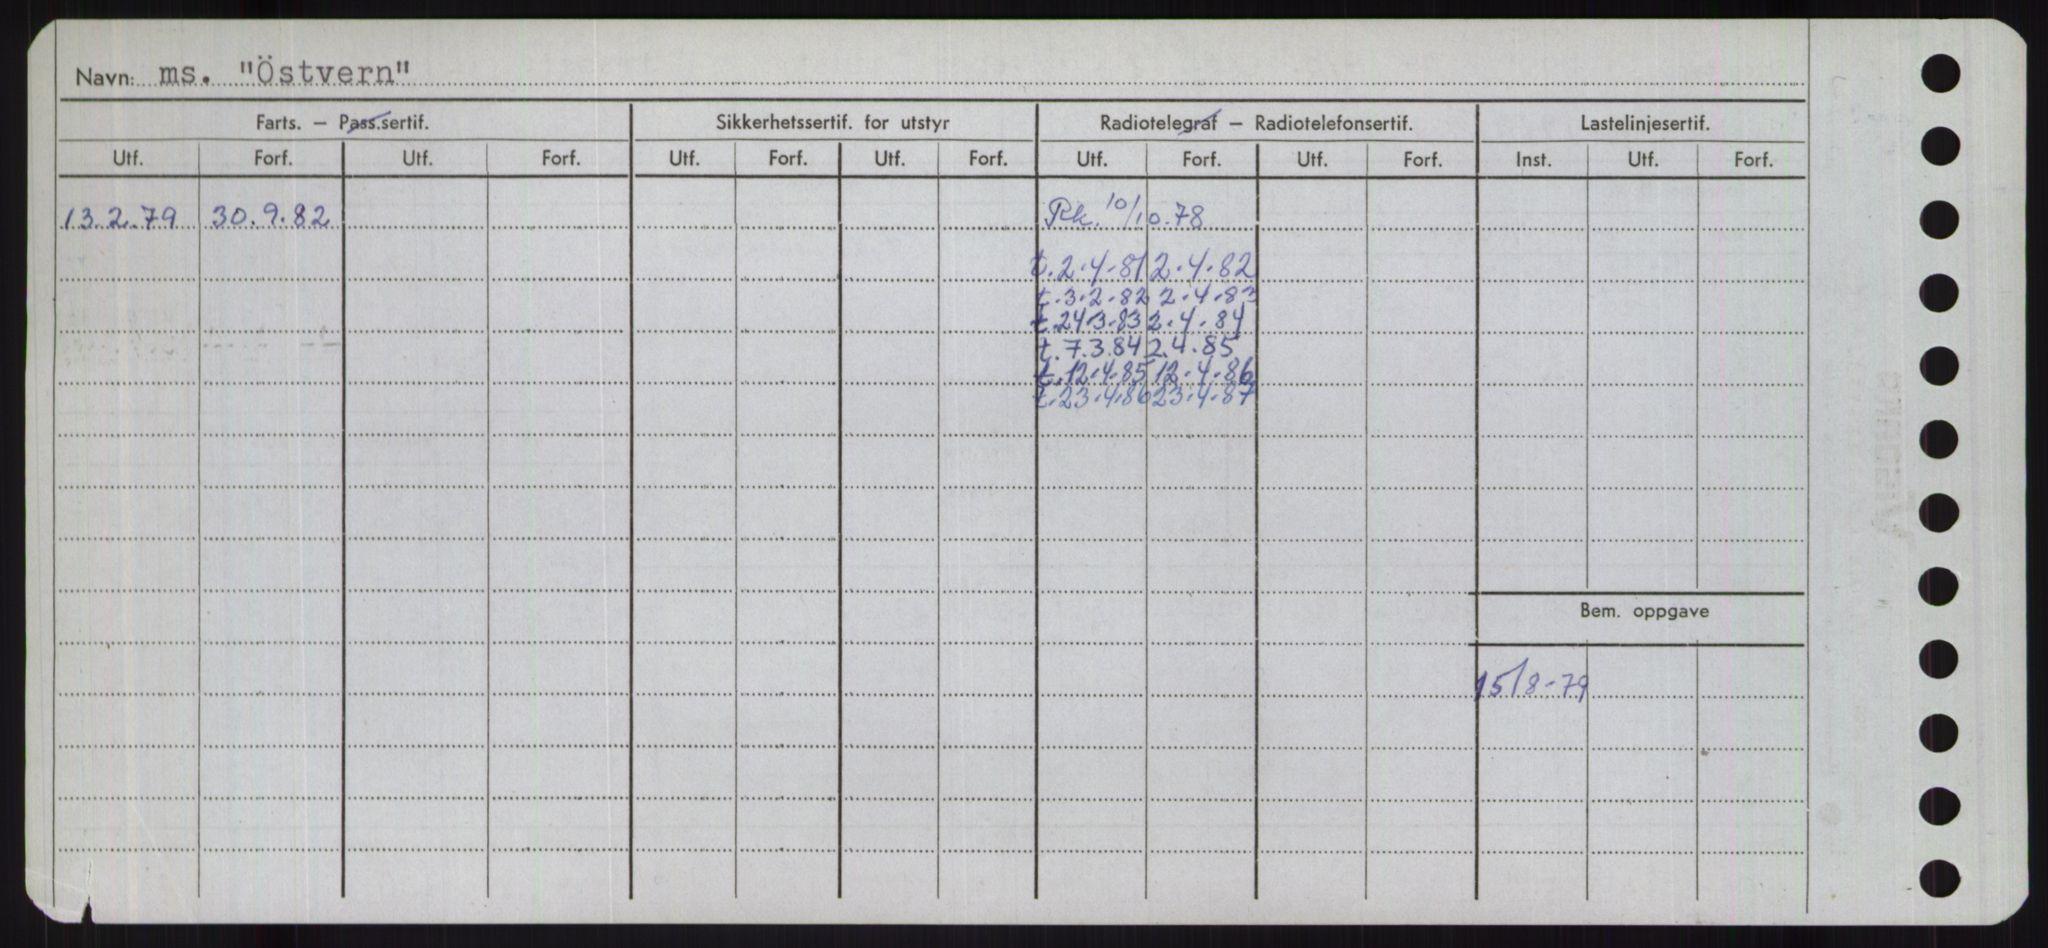 RA, Sjøfartsdirektoratet med forløpere, Skipsmålingen, H/Ha/L0006: Fartøy, Sver-Å, s. 775